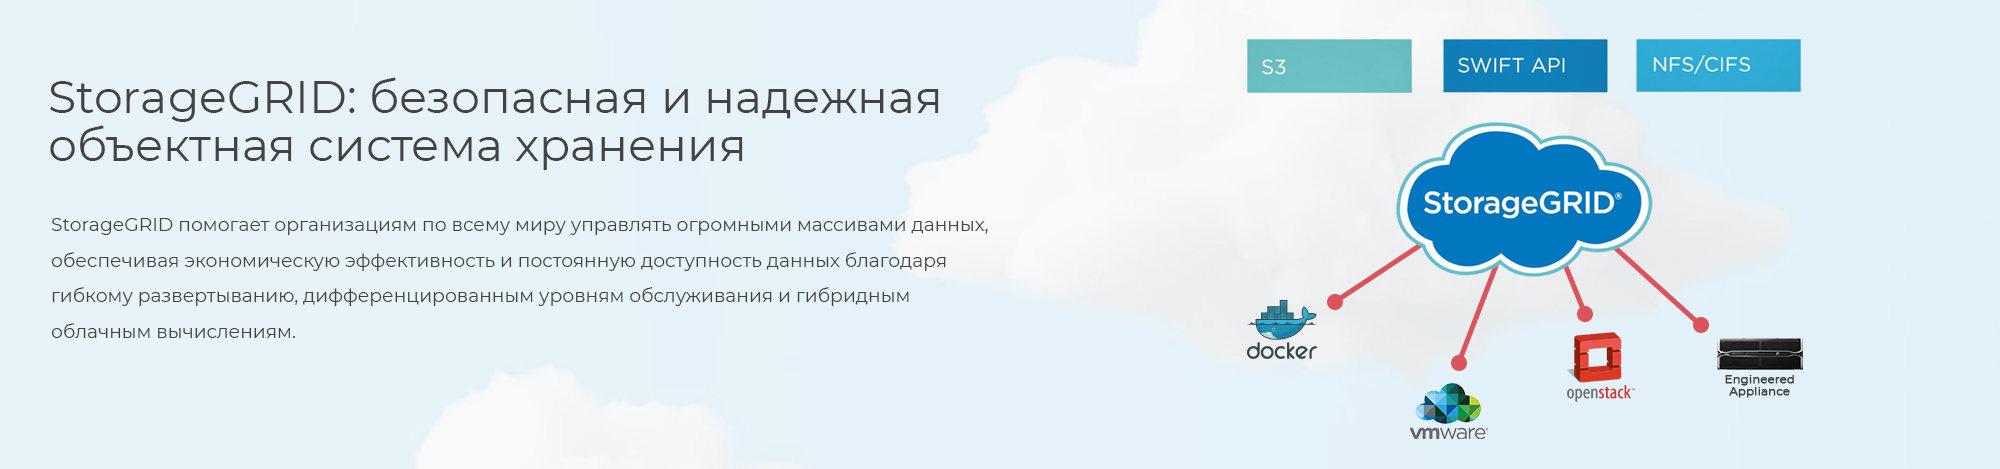 StorageGRID-объектная-система-хранения-данных